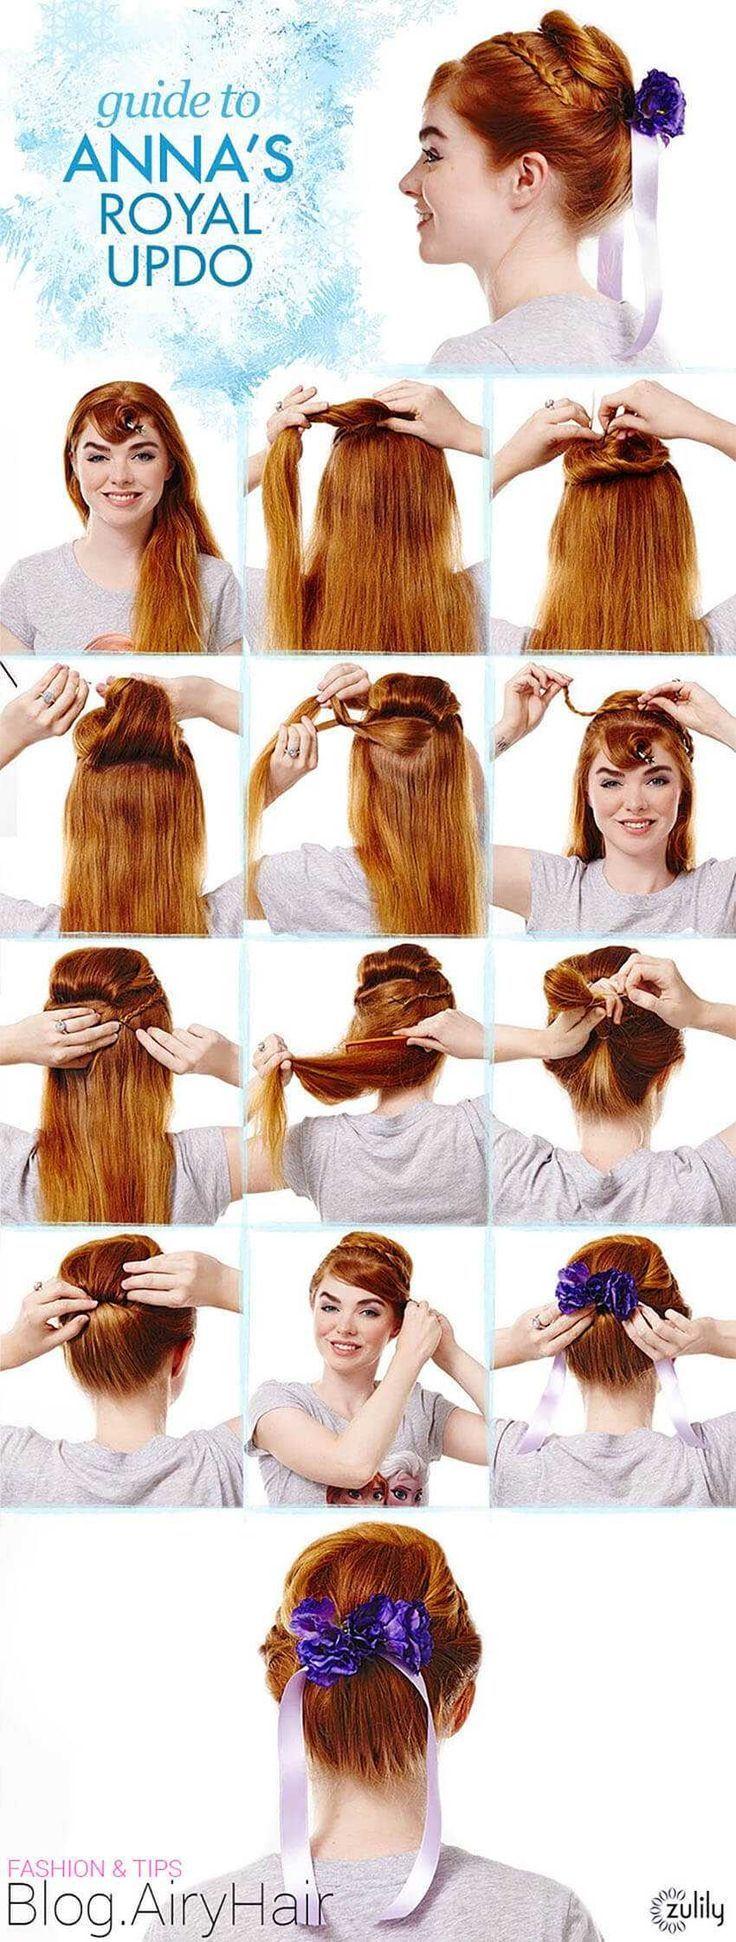 Step By Step Disney Frozen Elsa Anna Step Hair How To 2020 Frozen Hair Tutorial Frozen Hair Frozen Hairstyles